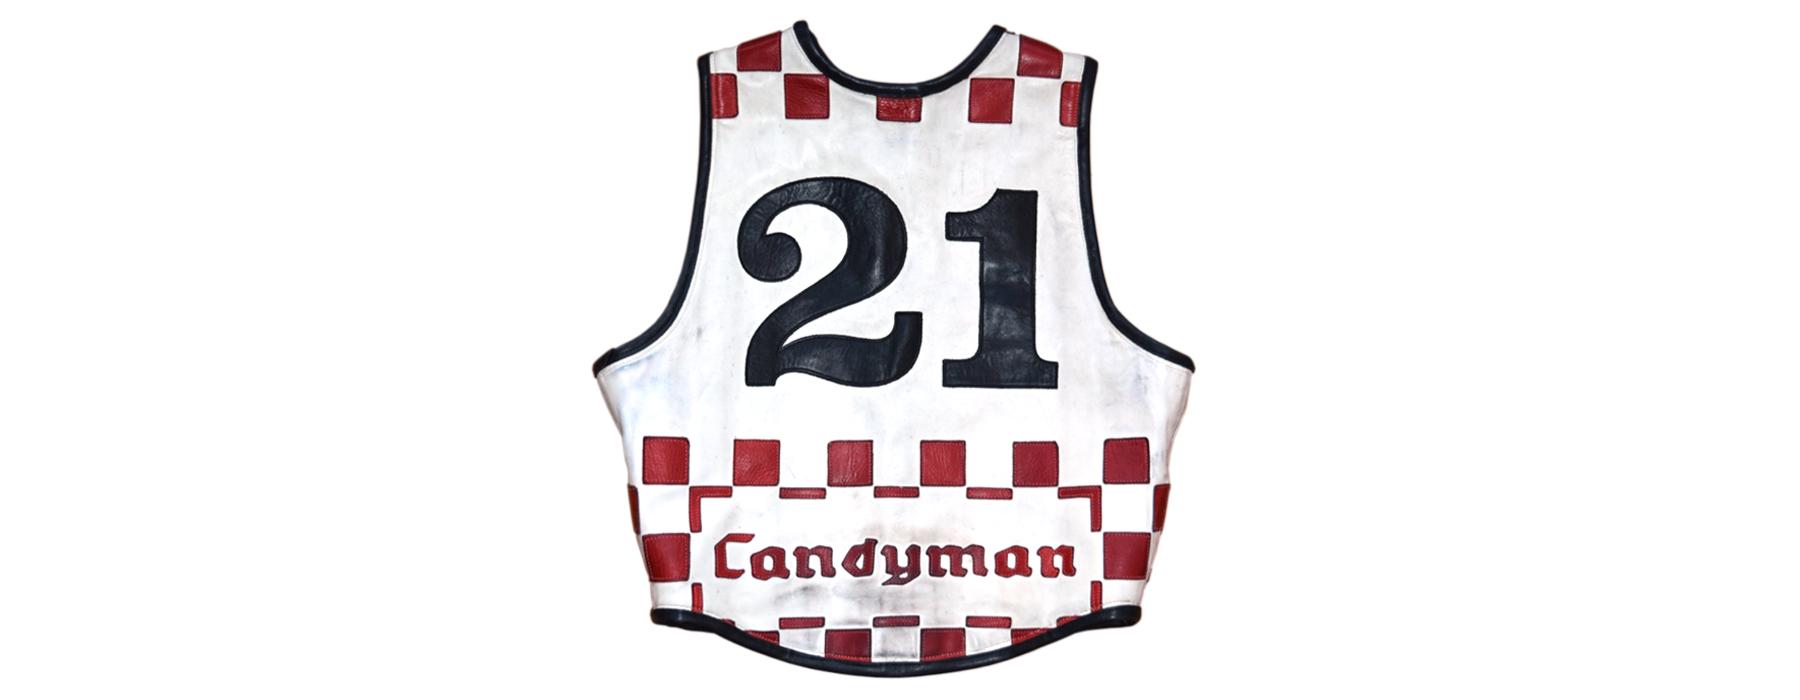 de curae | Candyman Racing Suit, vest right side back – Thorsten Schlesinger